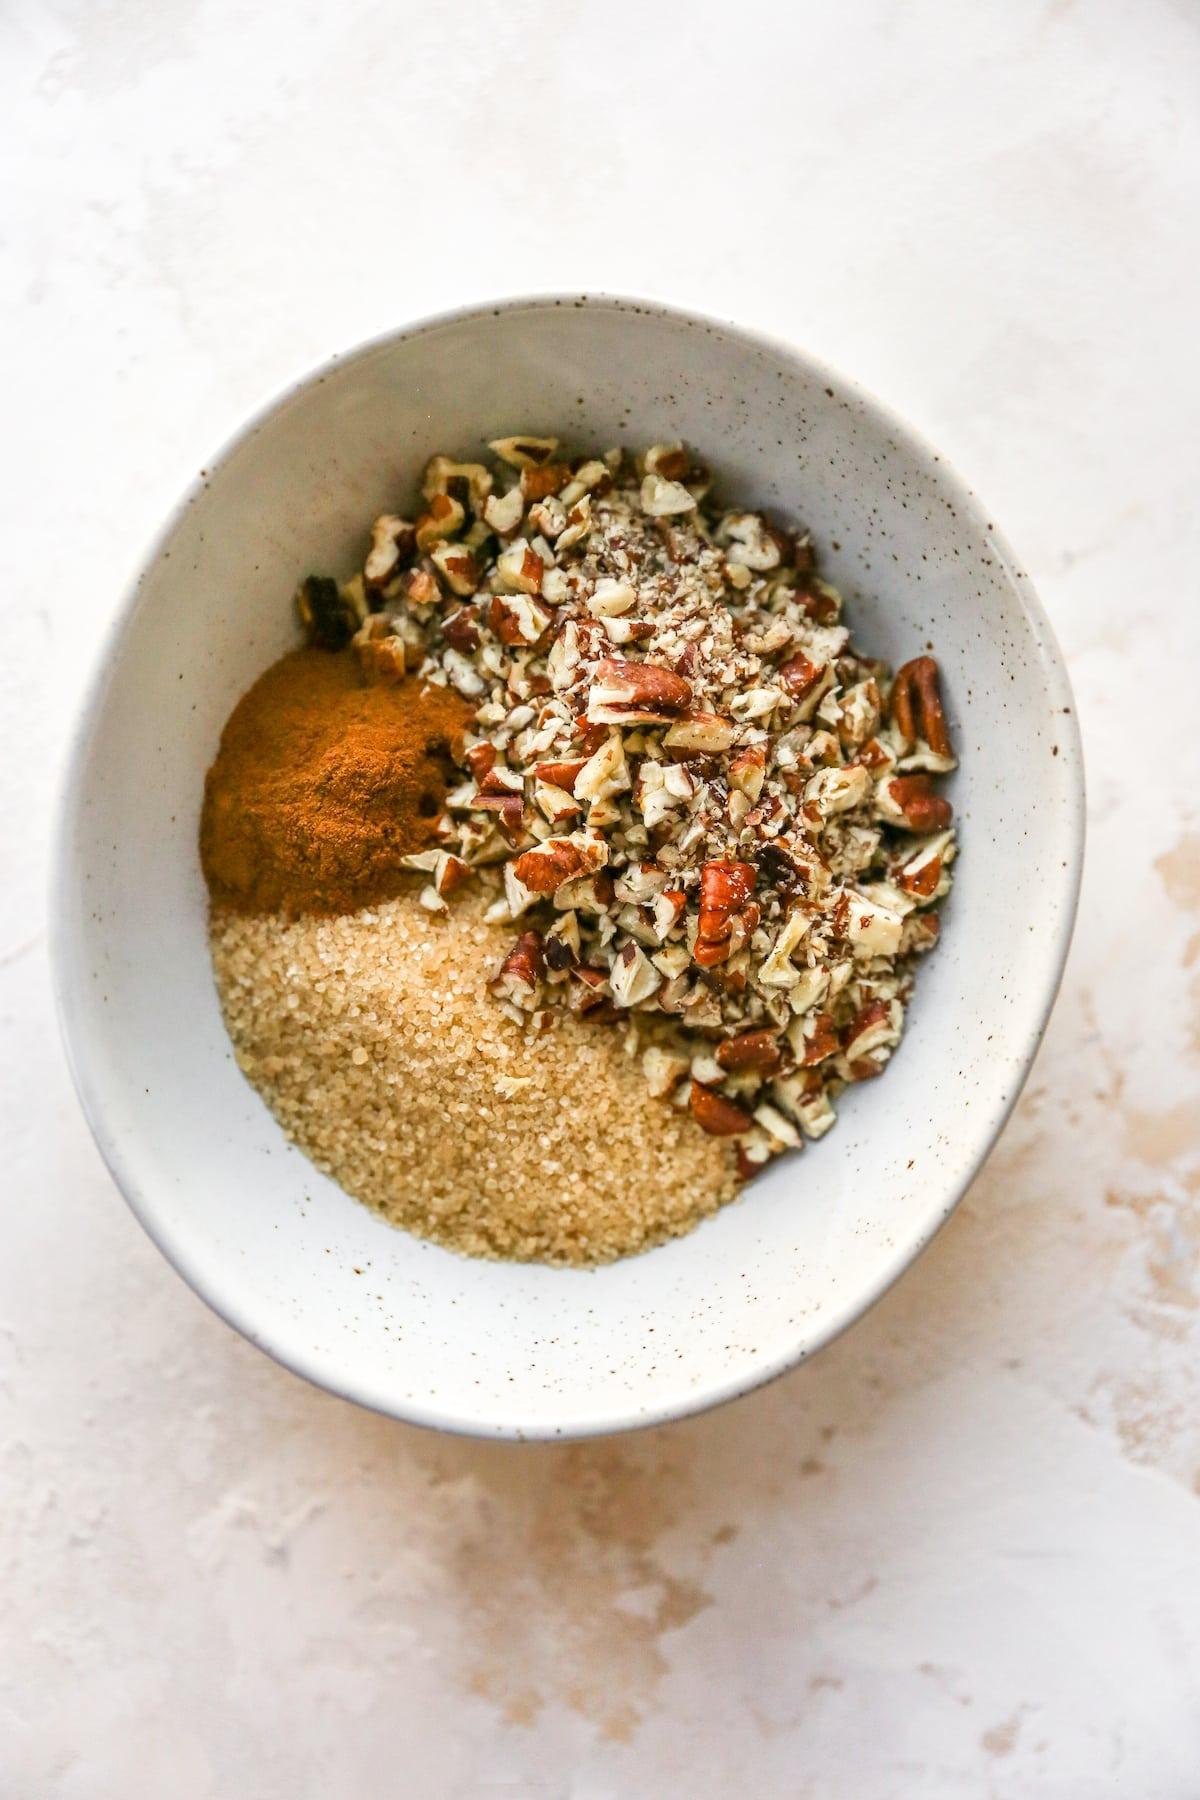 Bowl of cinnamon, sugar and pecans.